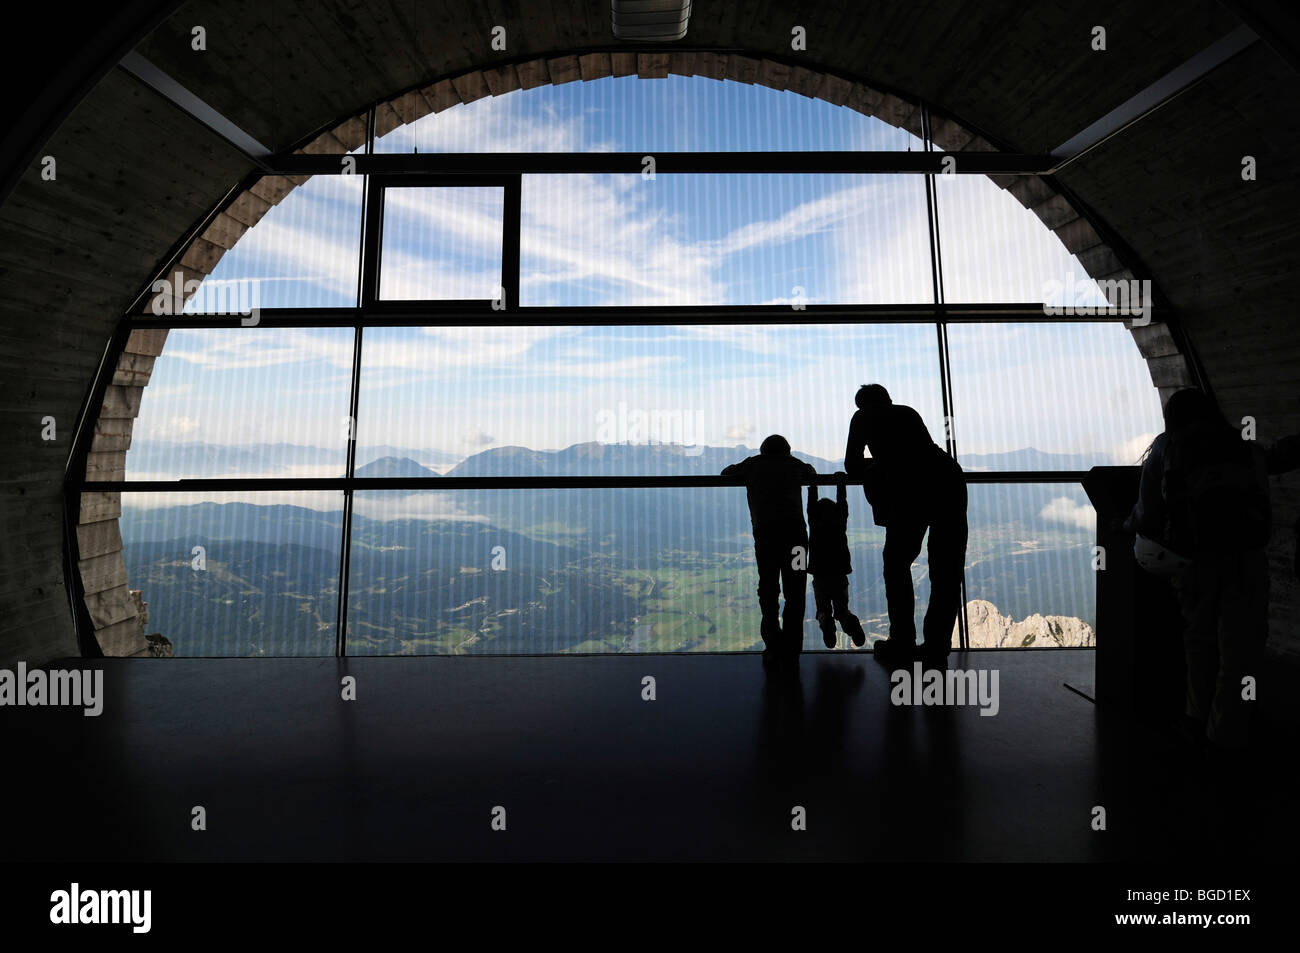 Museum Bergwelt Karwendel, visitors, telescope, Mittenwald, Karwendelgebirge mountains, Innsbruck, Tyrol, Austria, Stock Photo